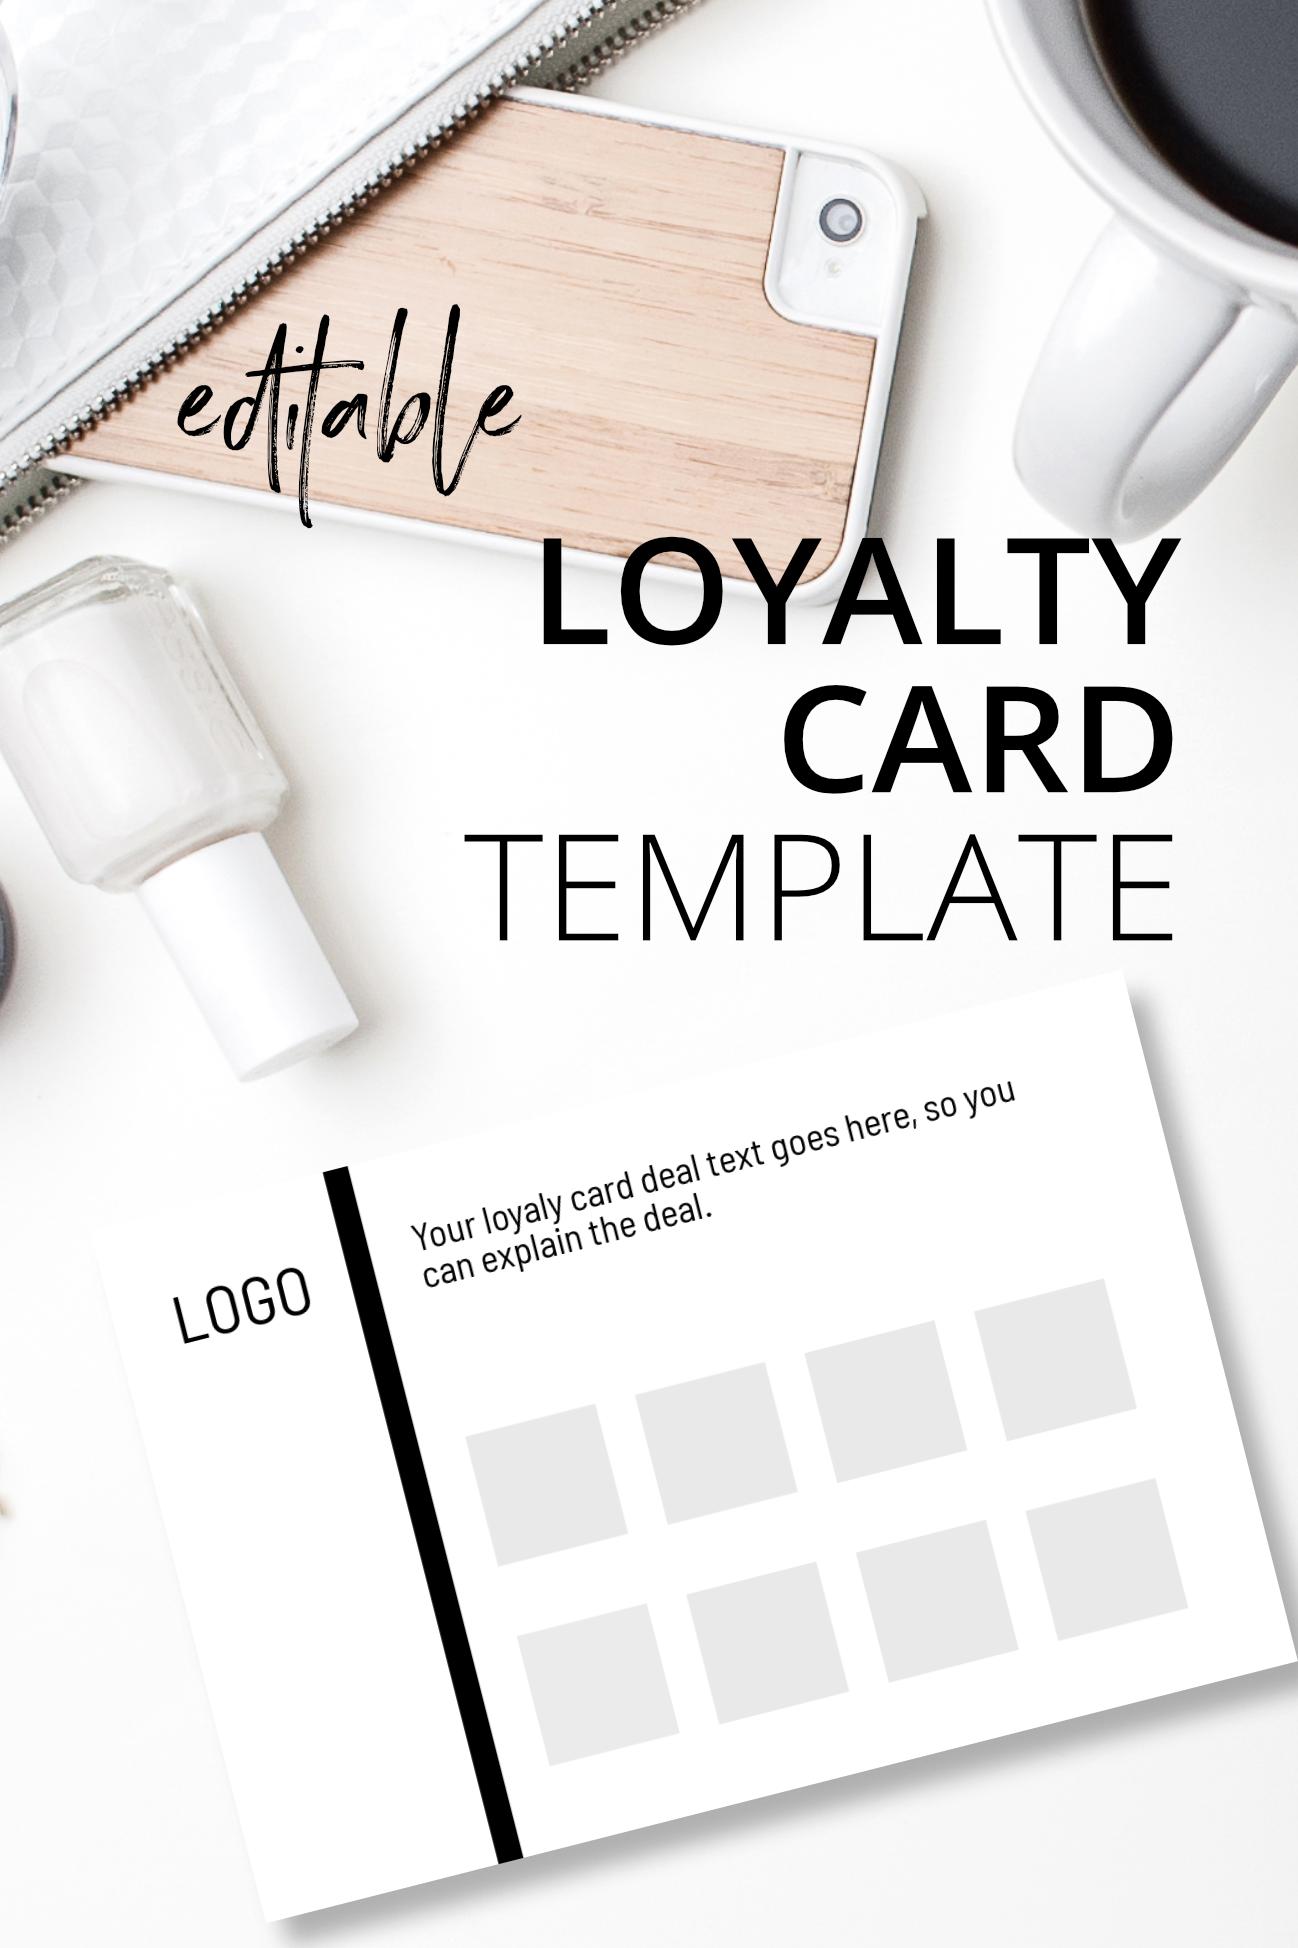 Loyalty Card Design Template Loyalty Card Template Loyalty Card Design Making Money On Etsy